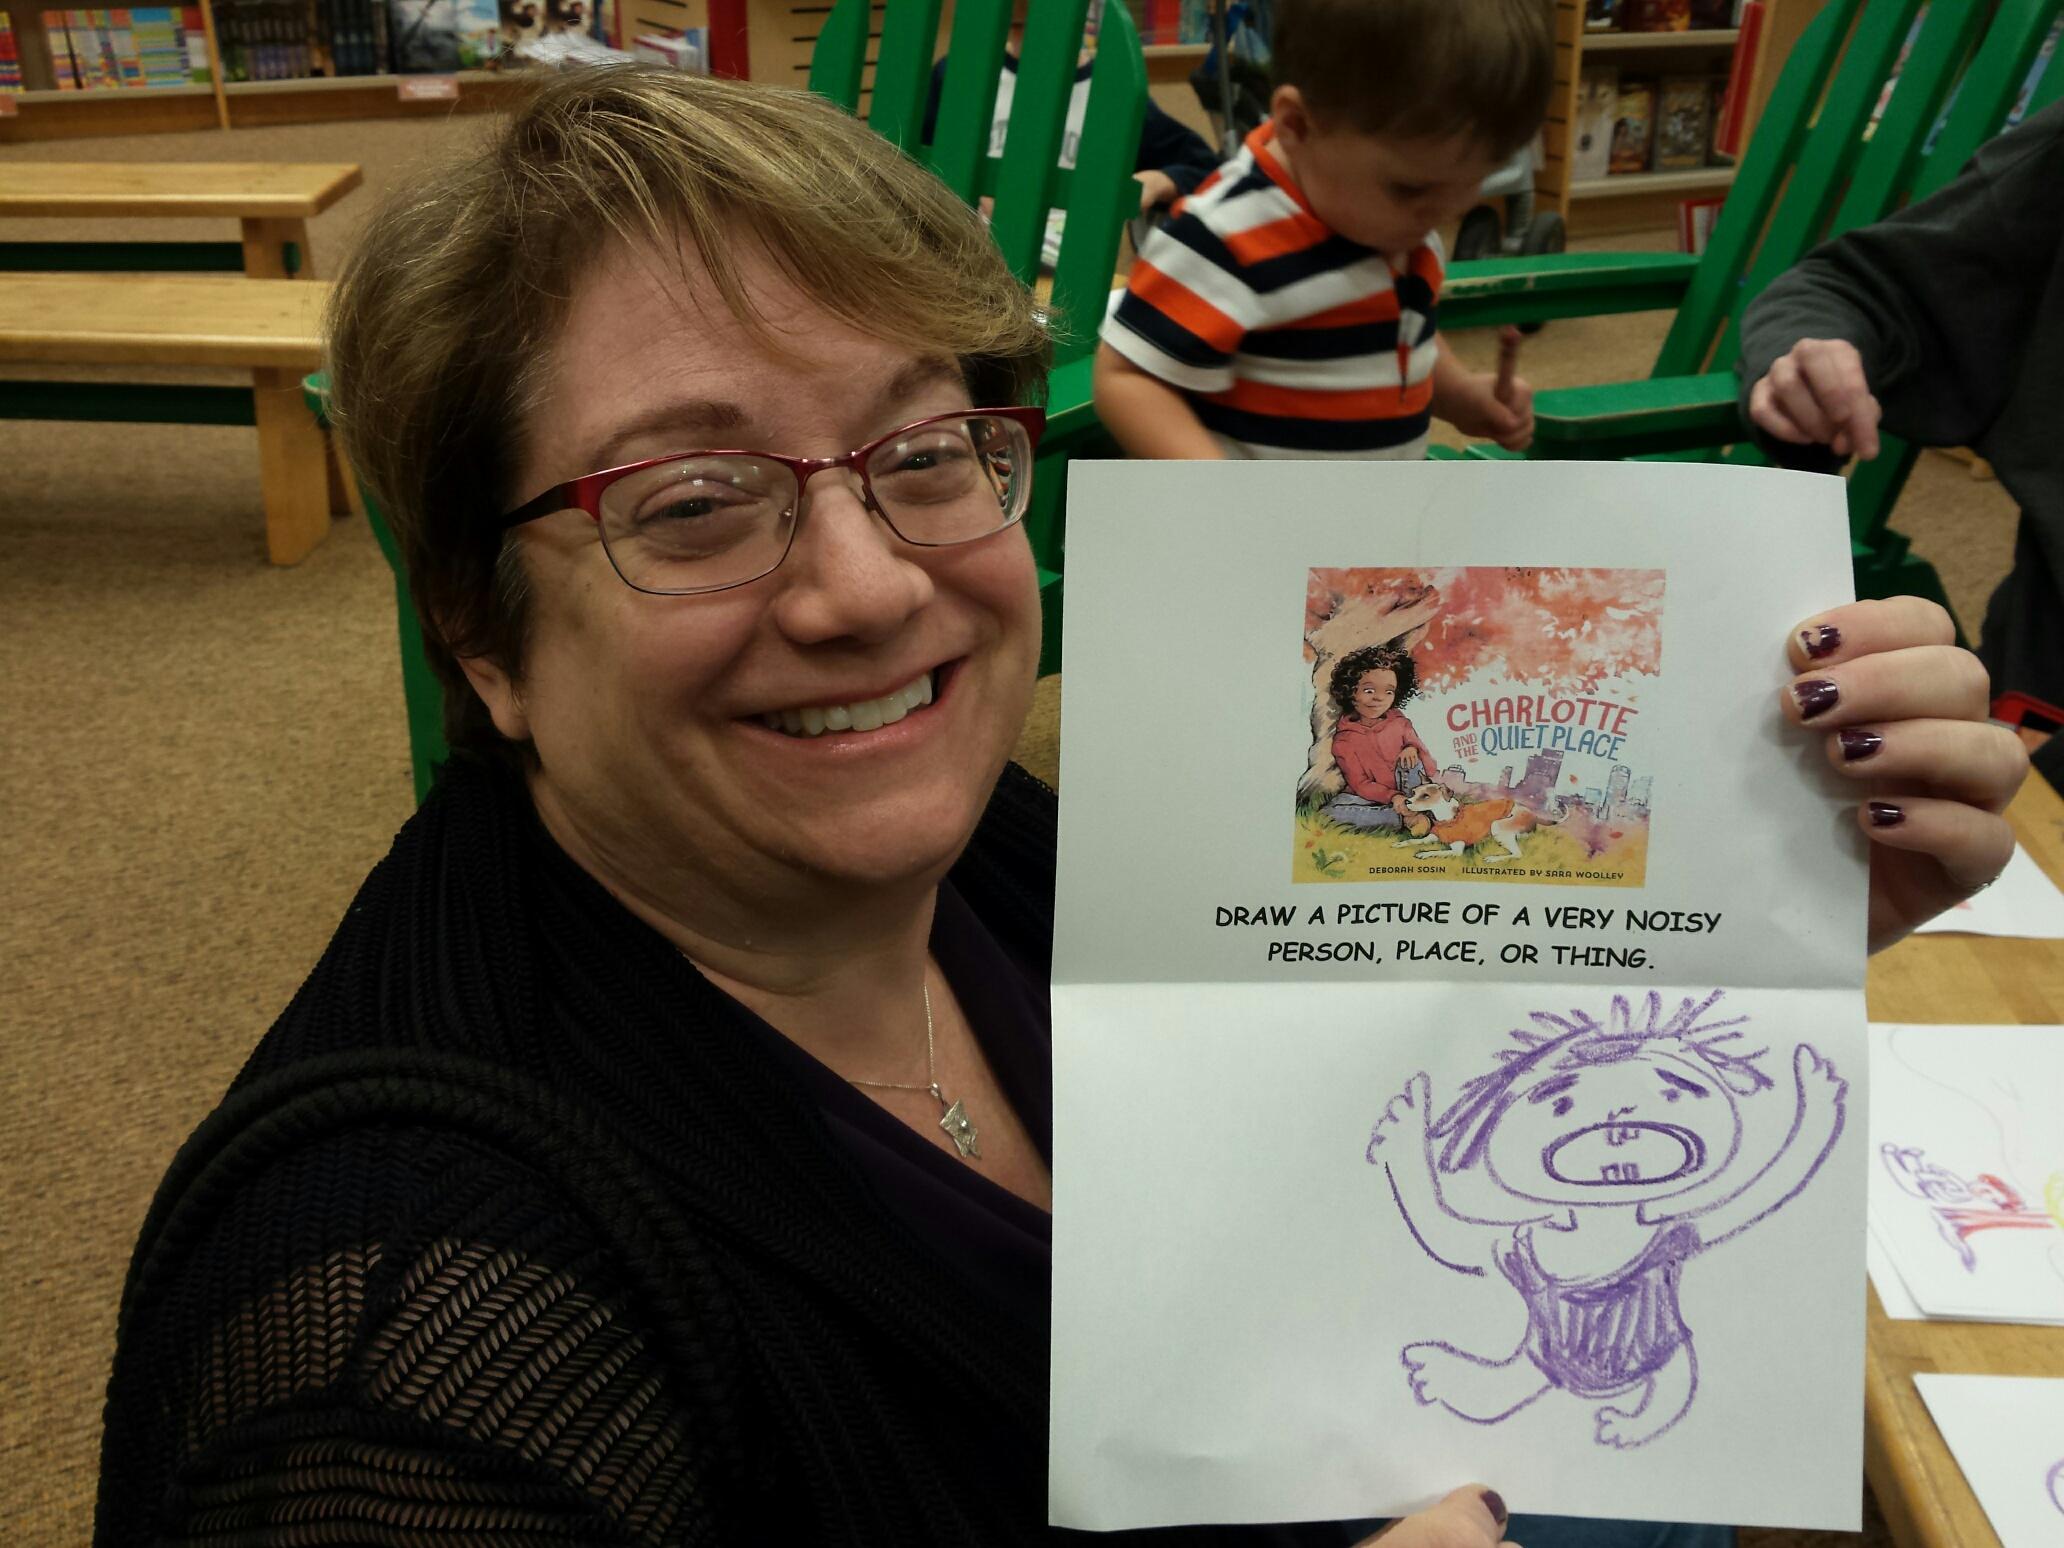 Phyllis draws a noisy person.